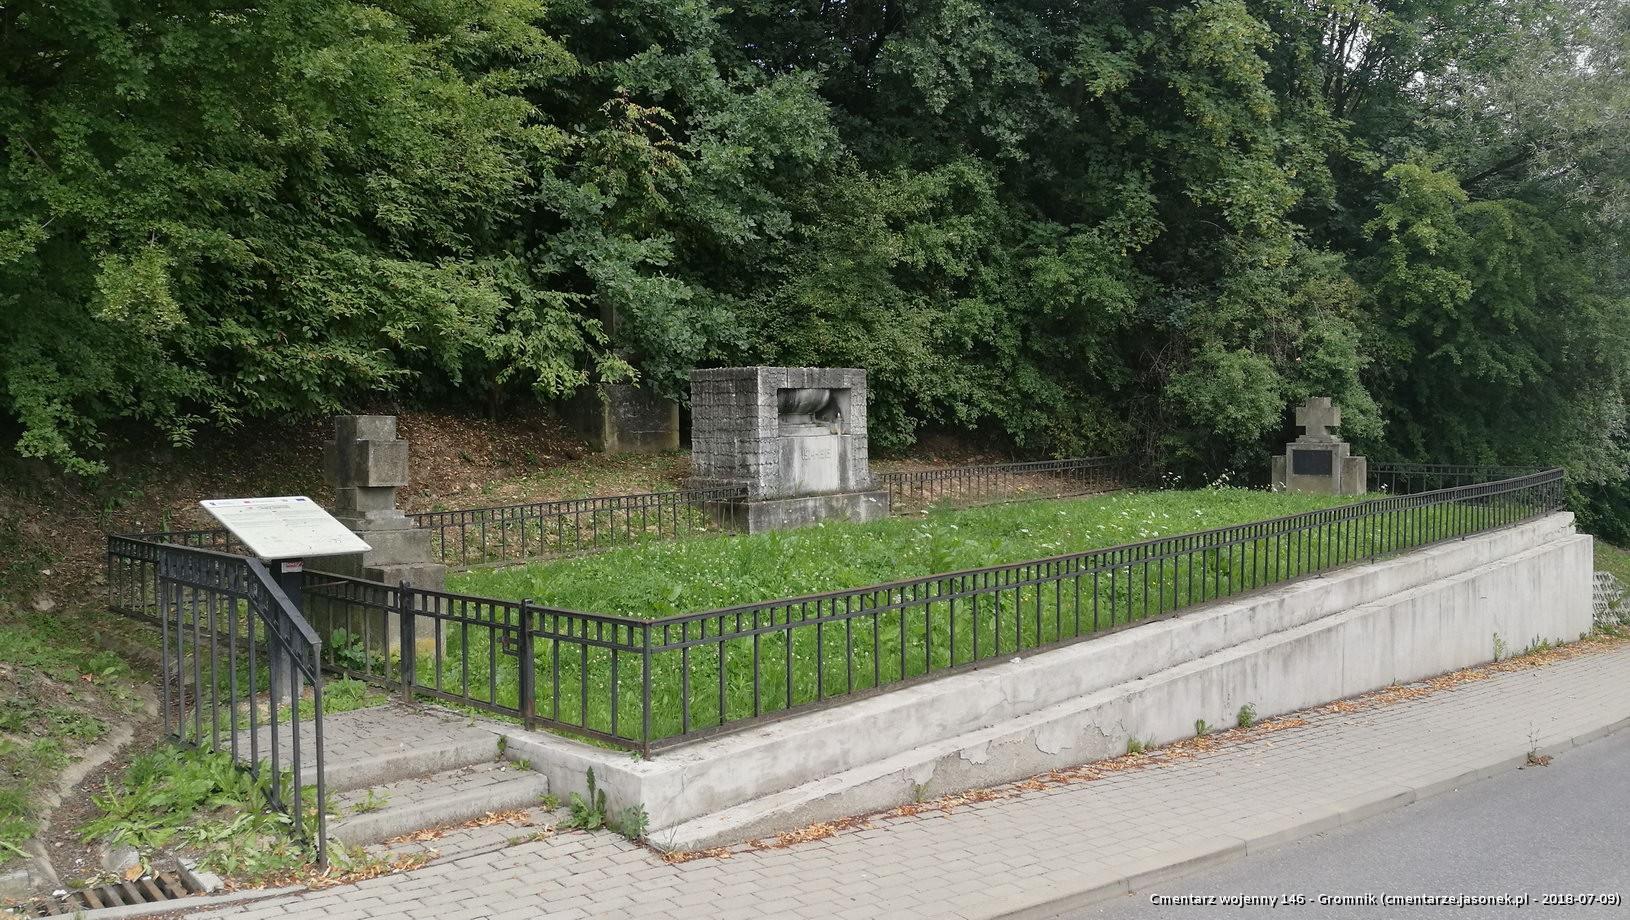 Cmentarz wojenny 146 - Gromnik